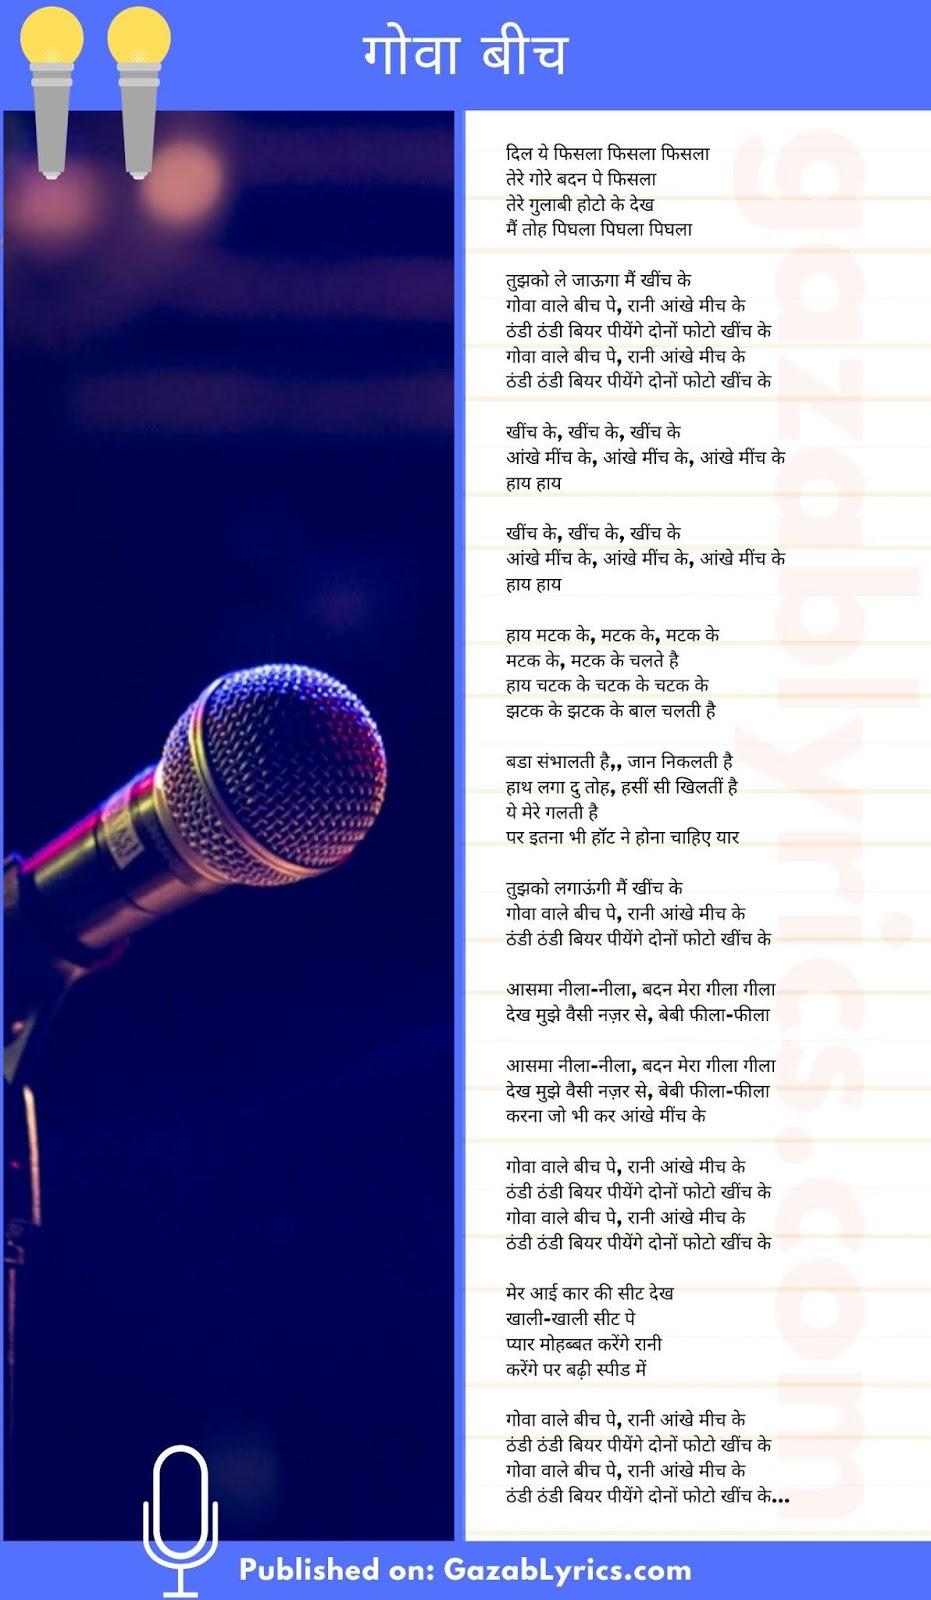 Goa Beach song lyrics image